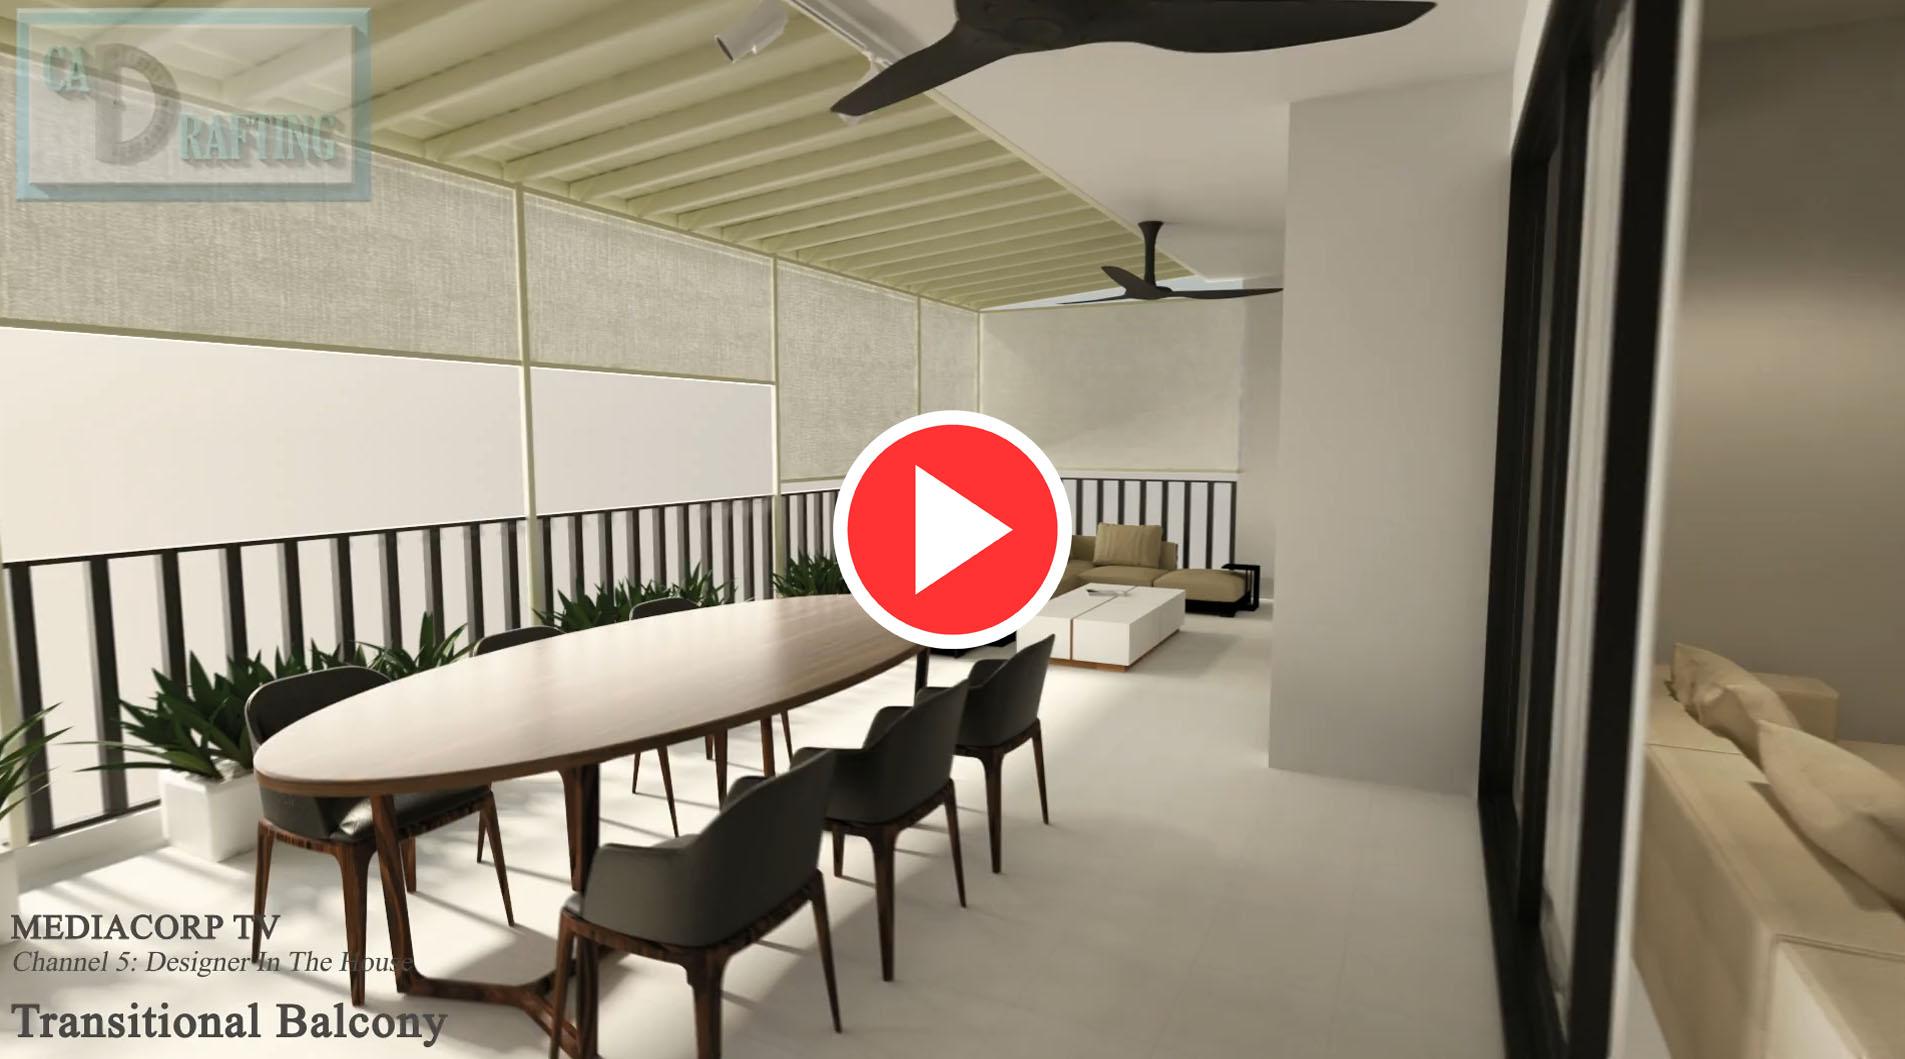 Balcony WalkThrough